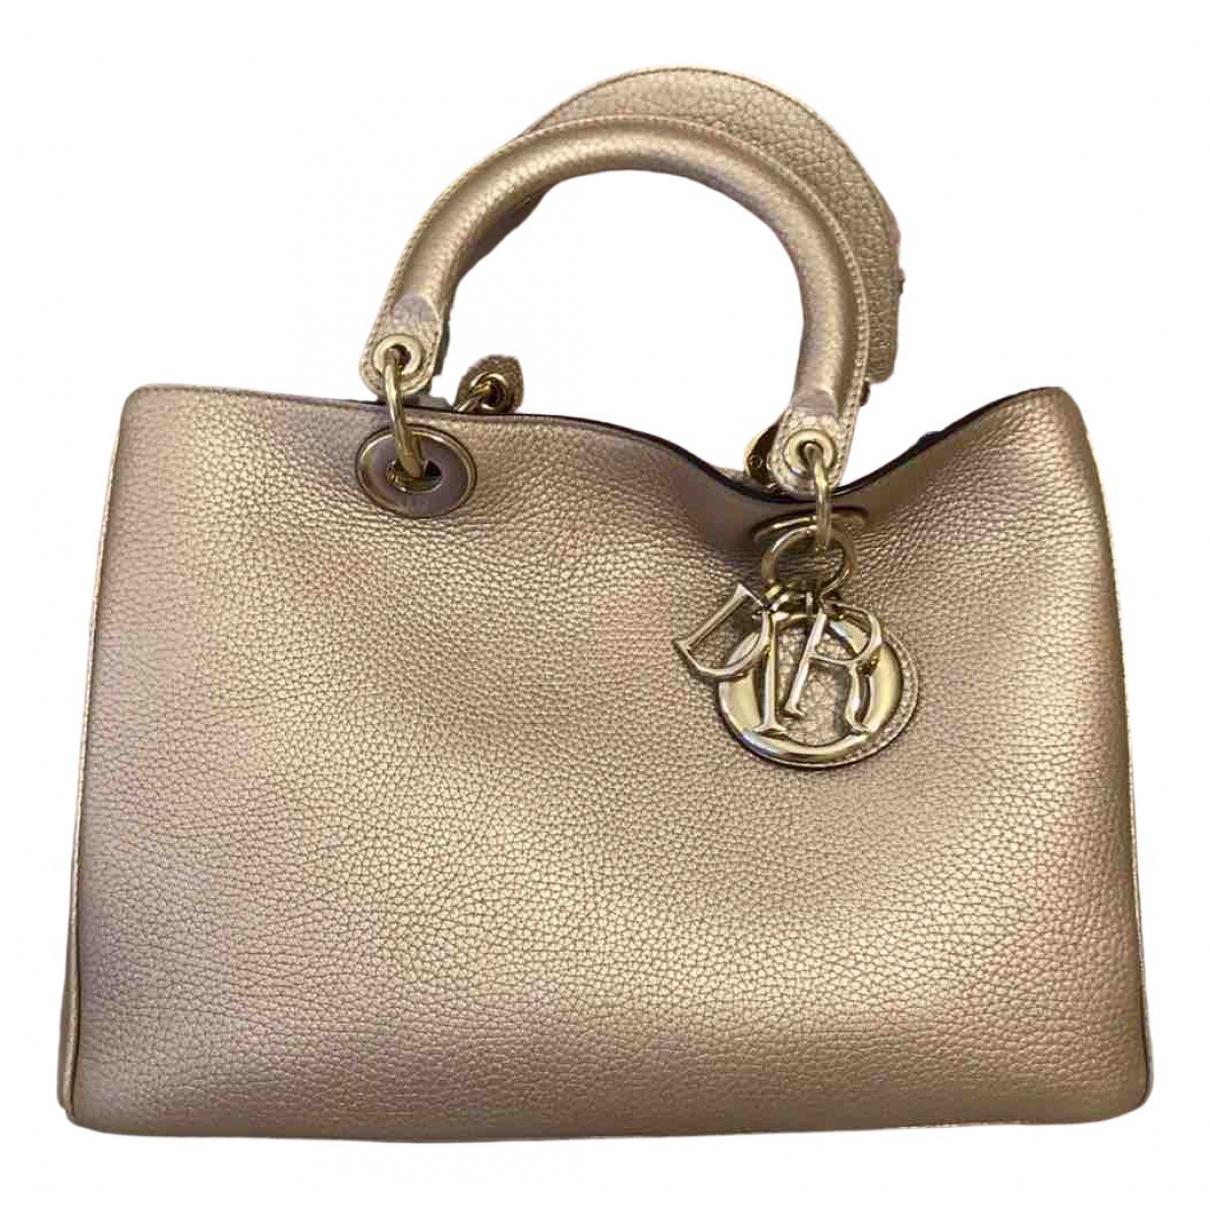 Dior Diorissimo Gold Leather handbag for Women N